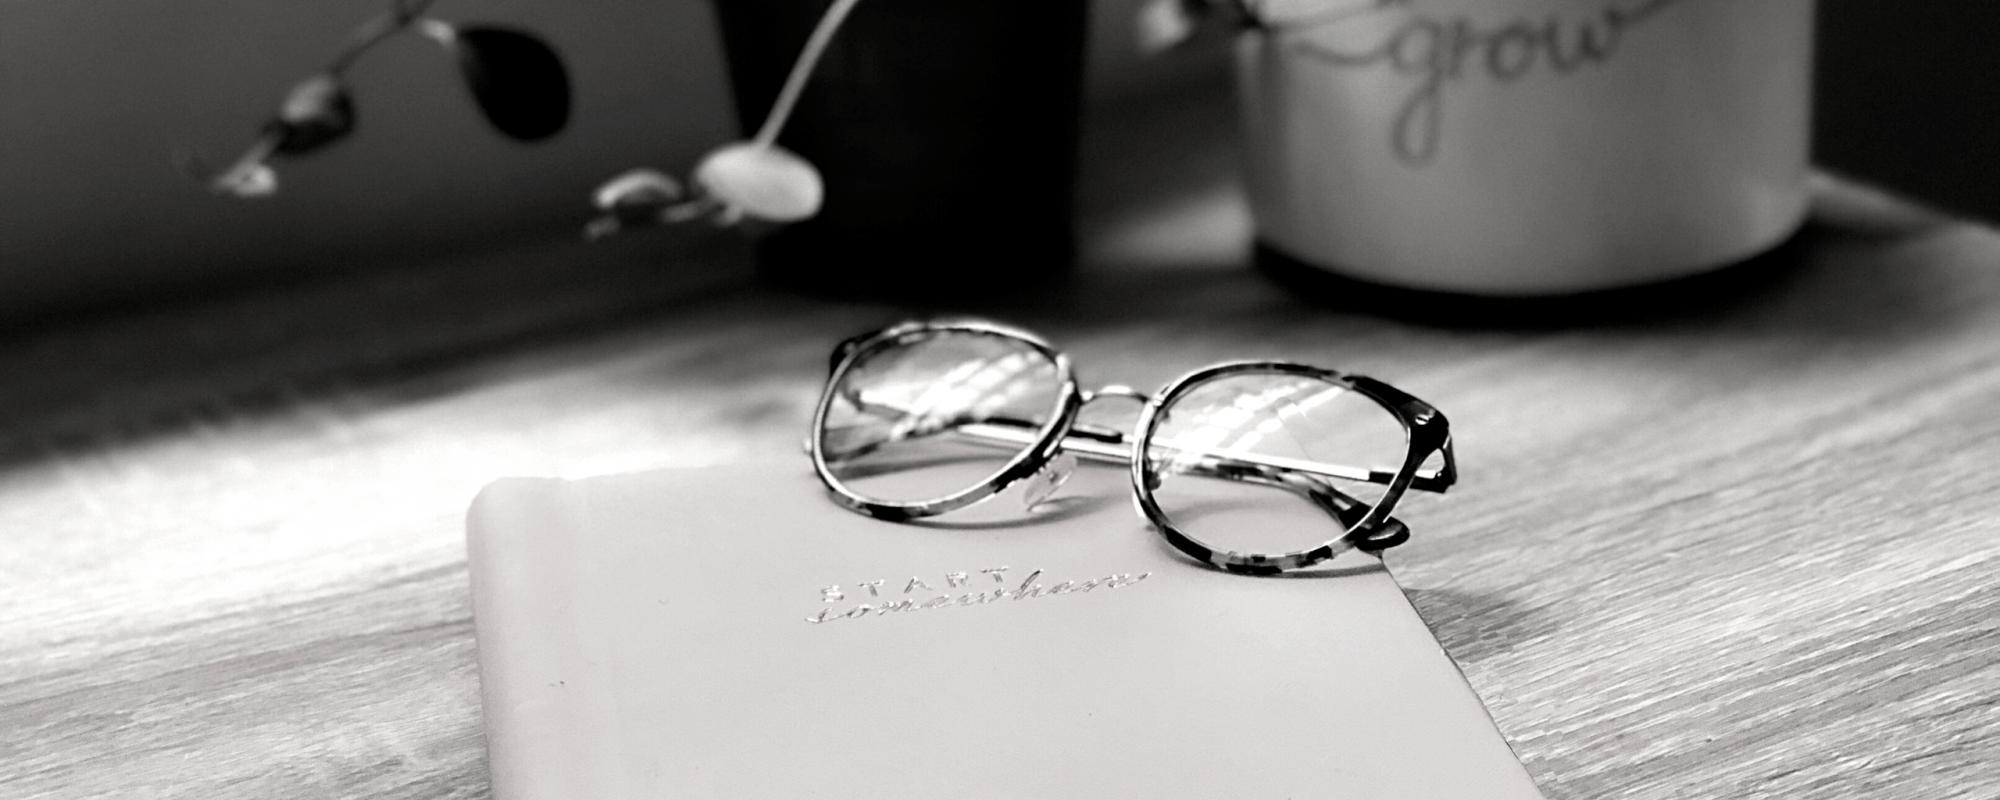 the-sunday-diaries-001-header